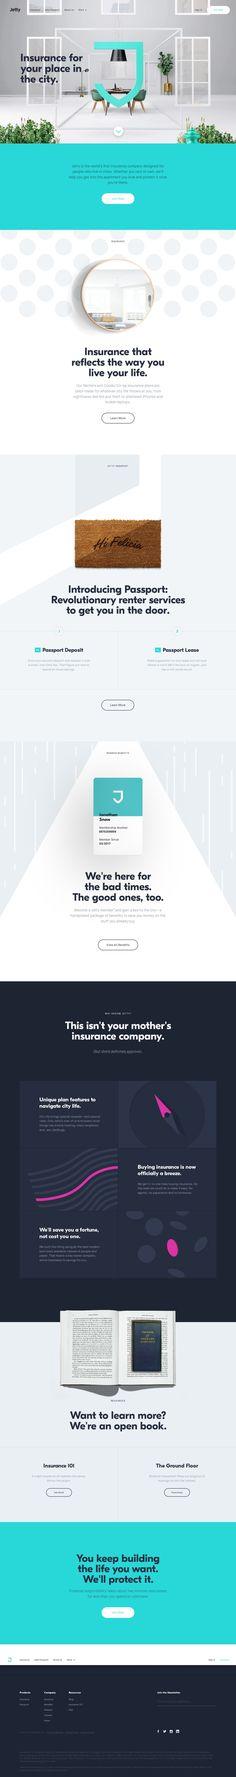 Jetty - Home  memo:ページを大きく使う感じと少しビビッドな色合い。フォントの強弱もついていてシンプルで見やすい